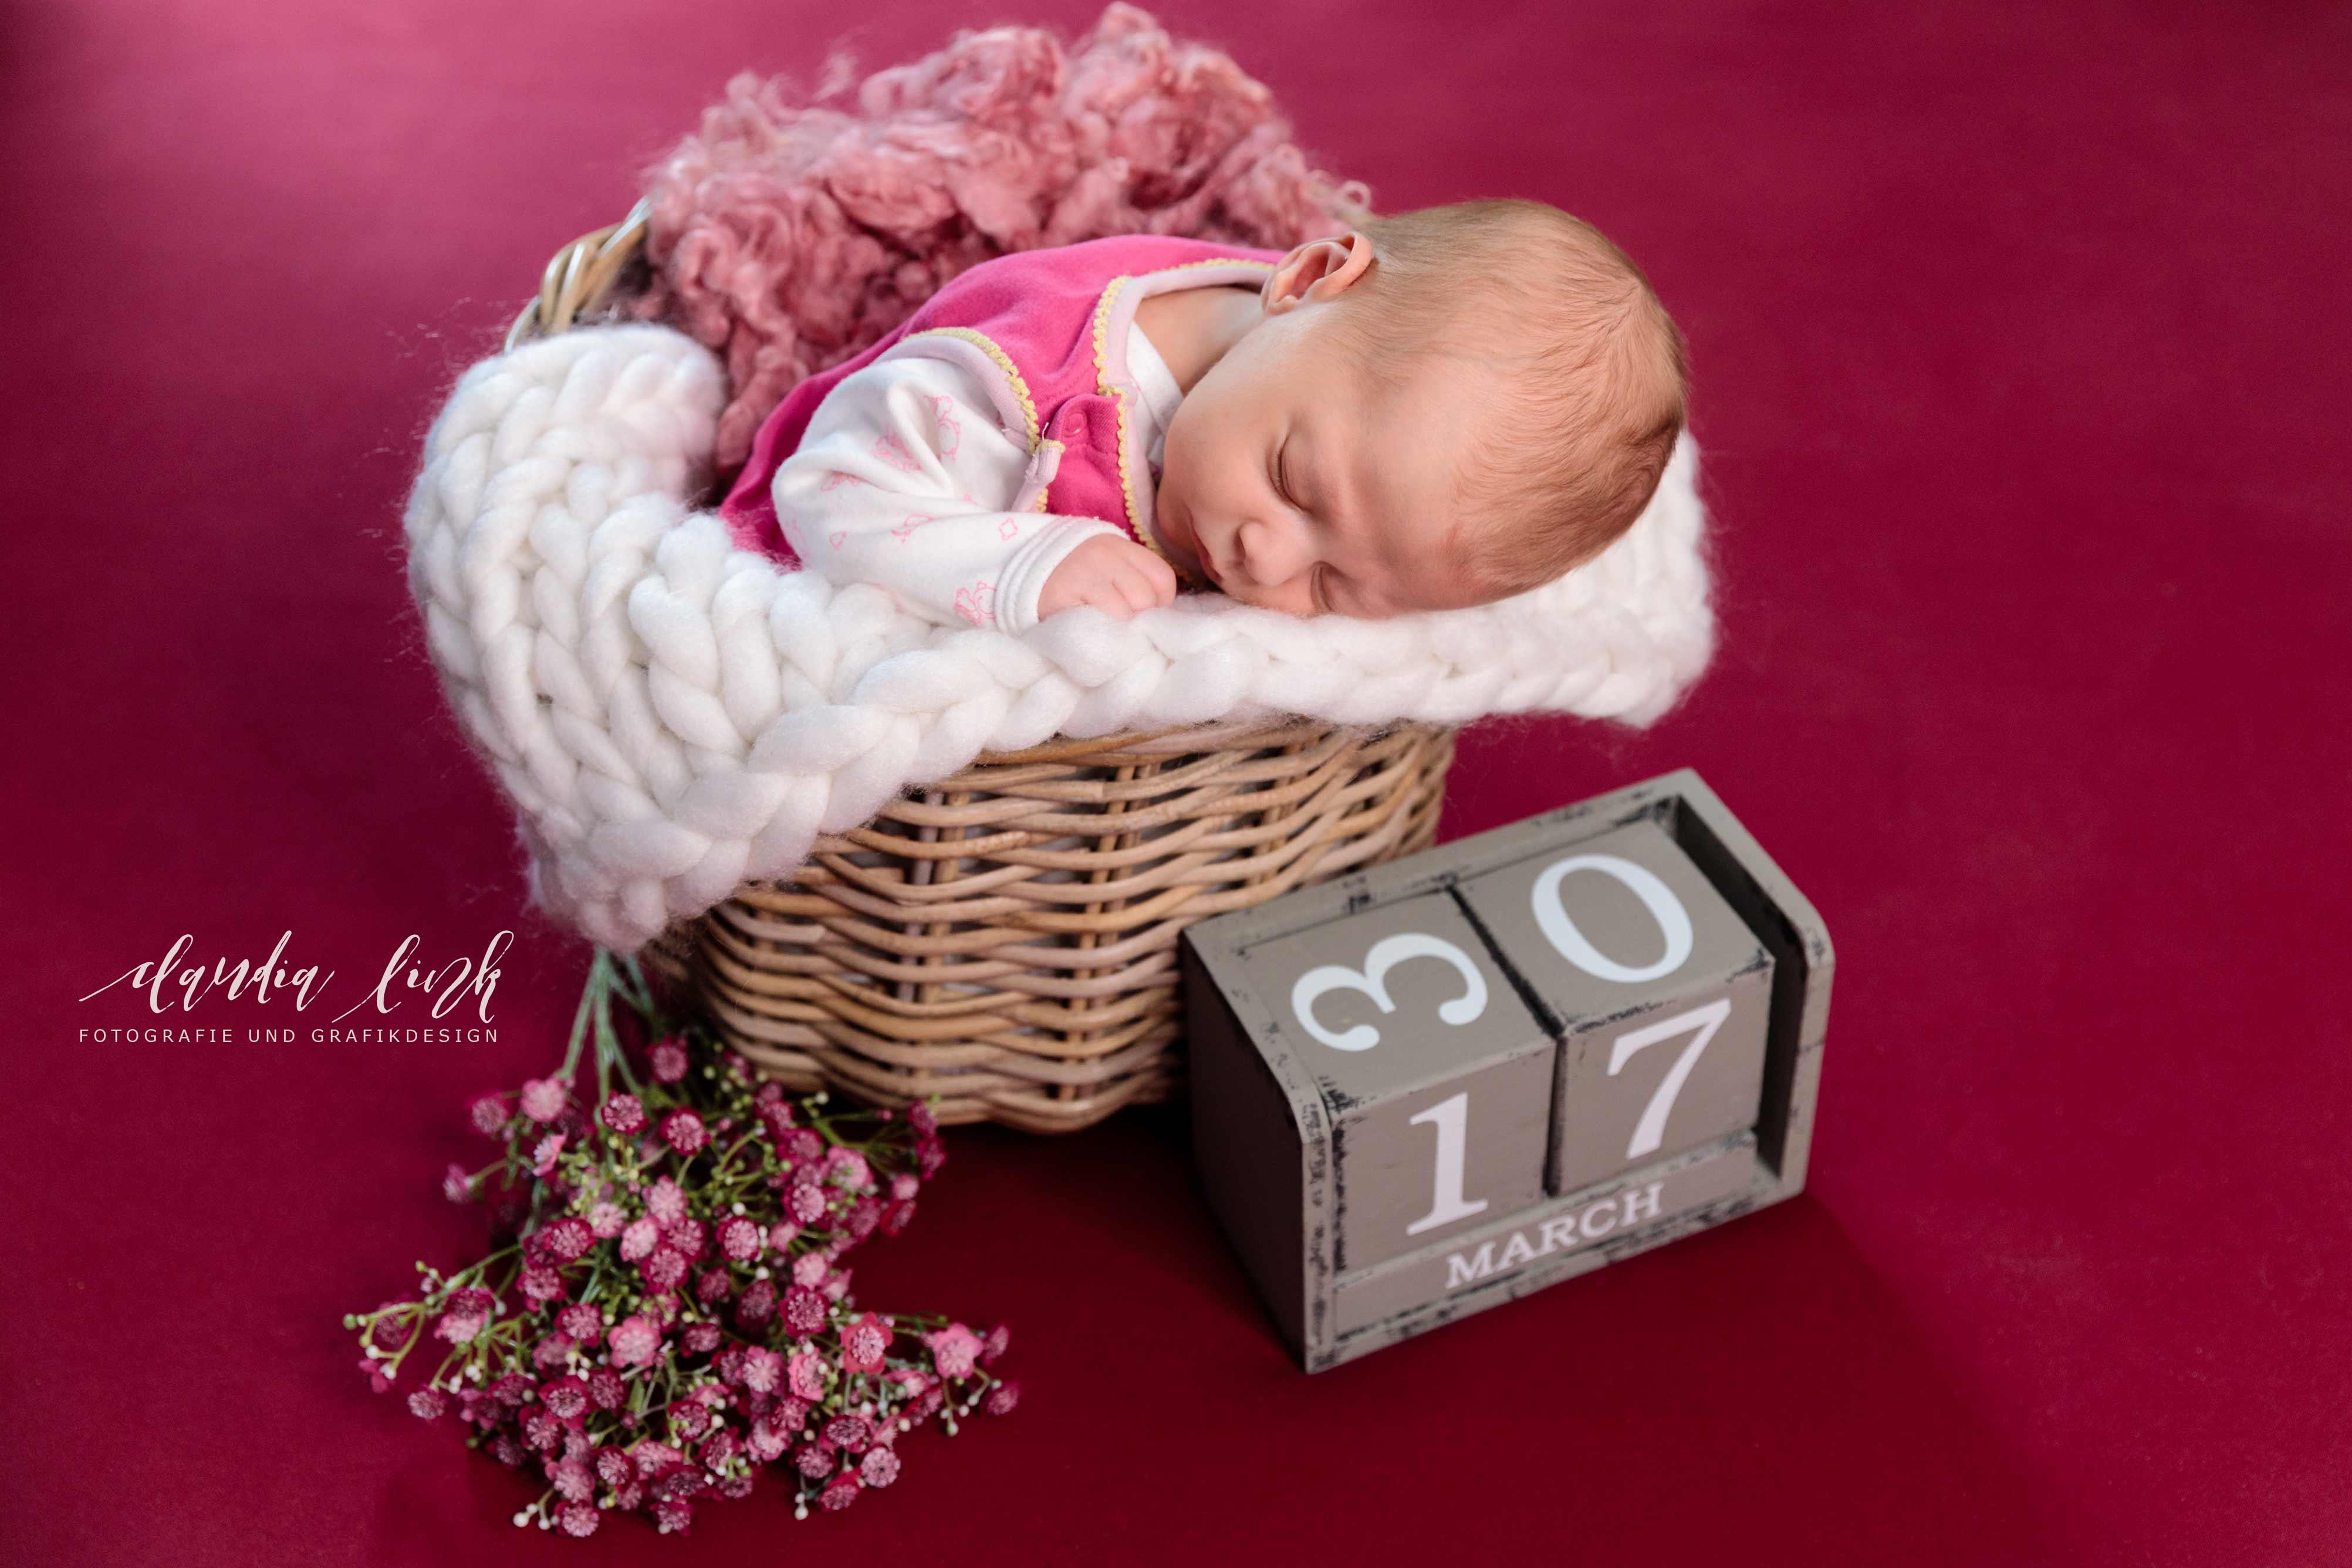 Newbornshooting in verträumten Farben IMG 8359w